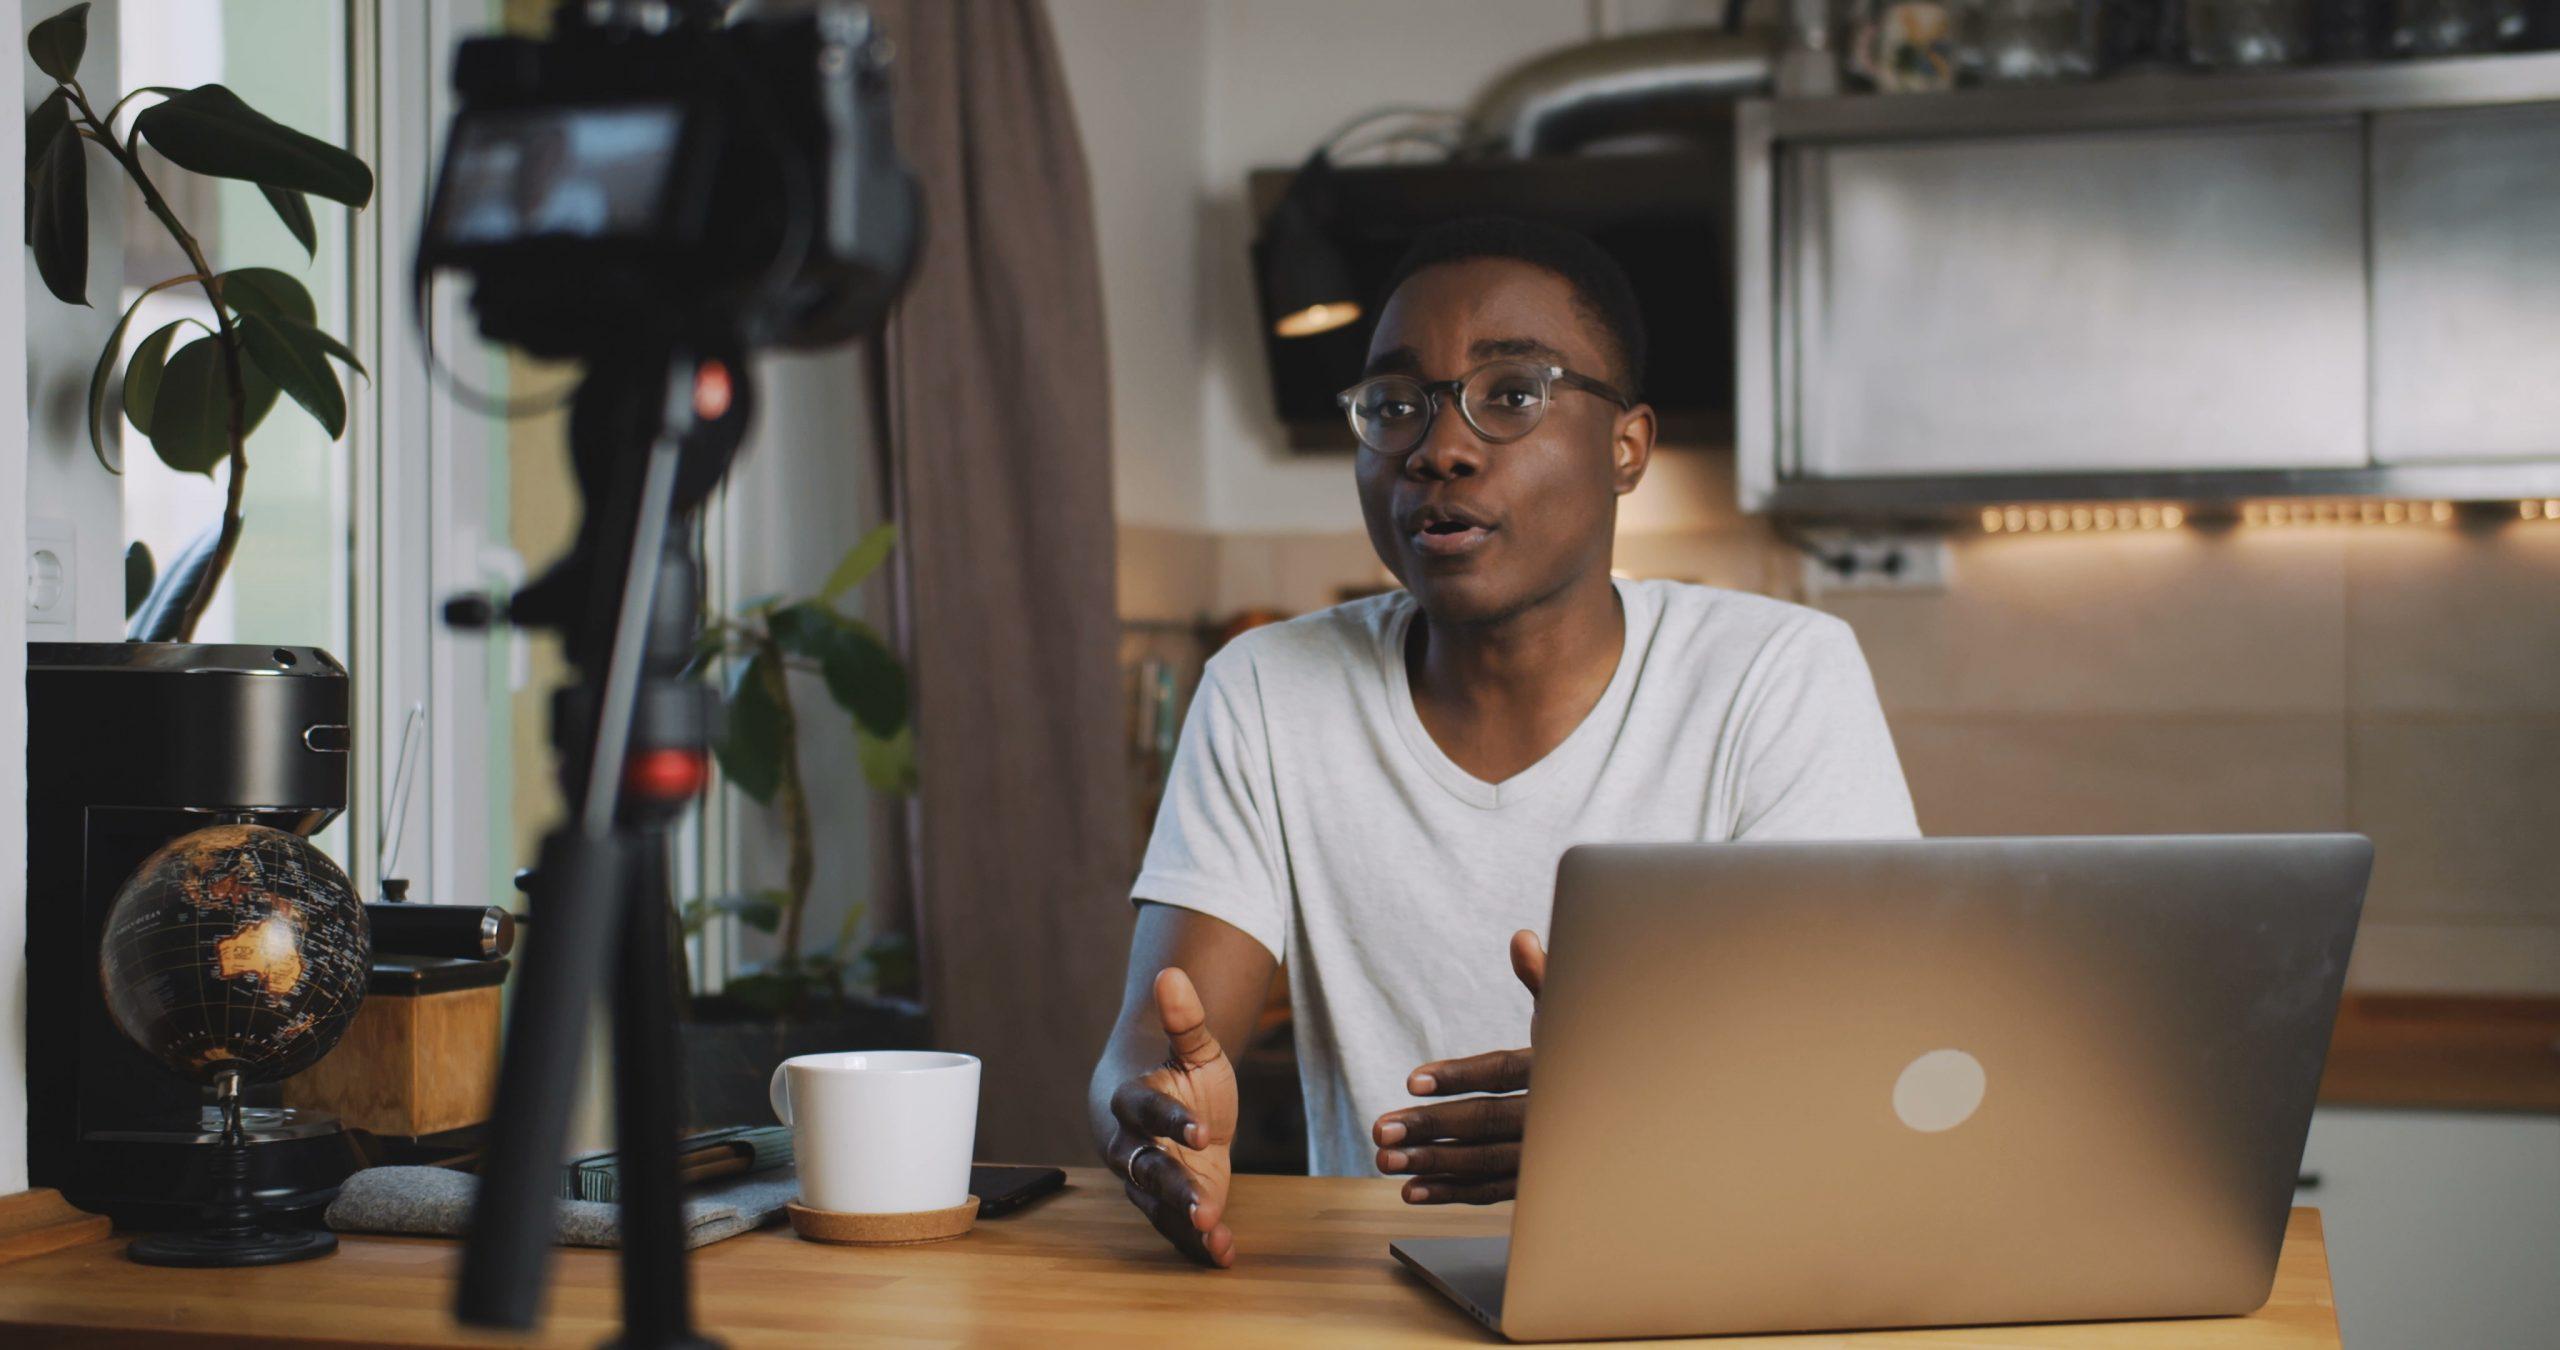 Man Live Streaming Professional at Home Setup